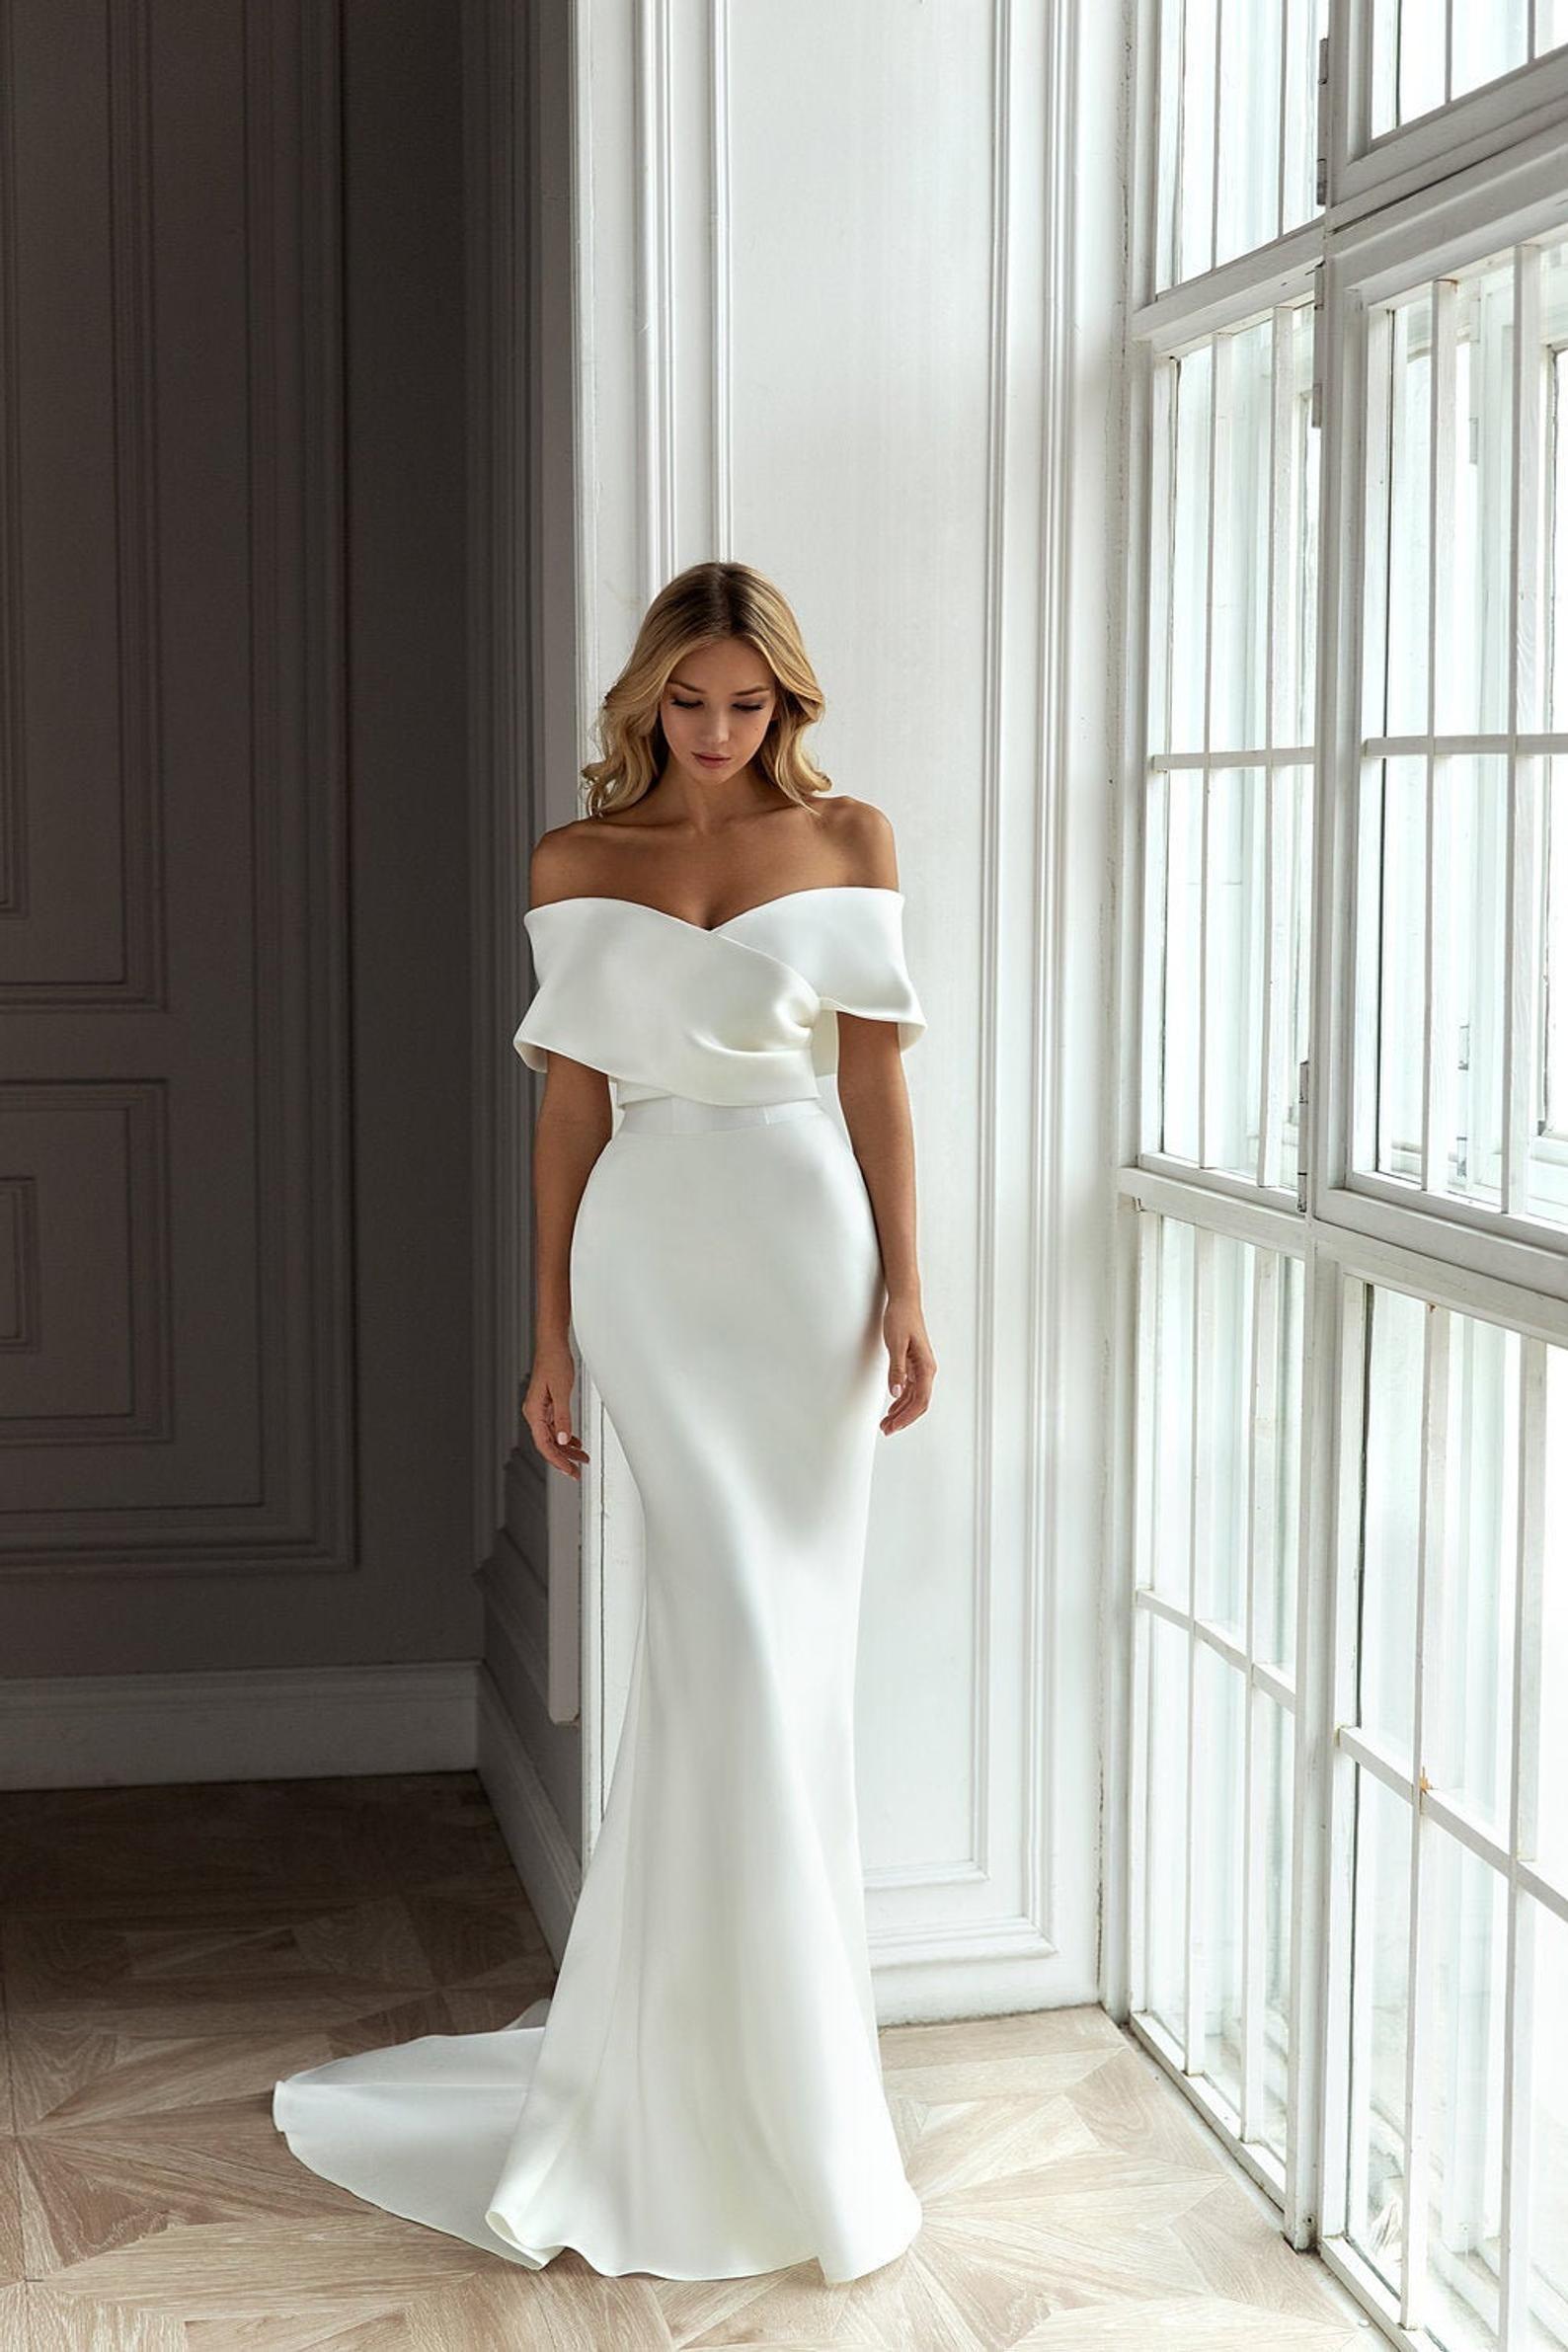 Gorgeous Stylish Wedding Dress Formal Wear Mermaid Trumpet Etsy Stylish Wedding Dresses Dream Wedding Dresses Formal Dresses For Weddings [ 2382 x 1588 Pixel ]